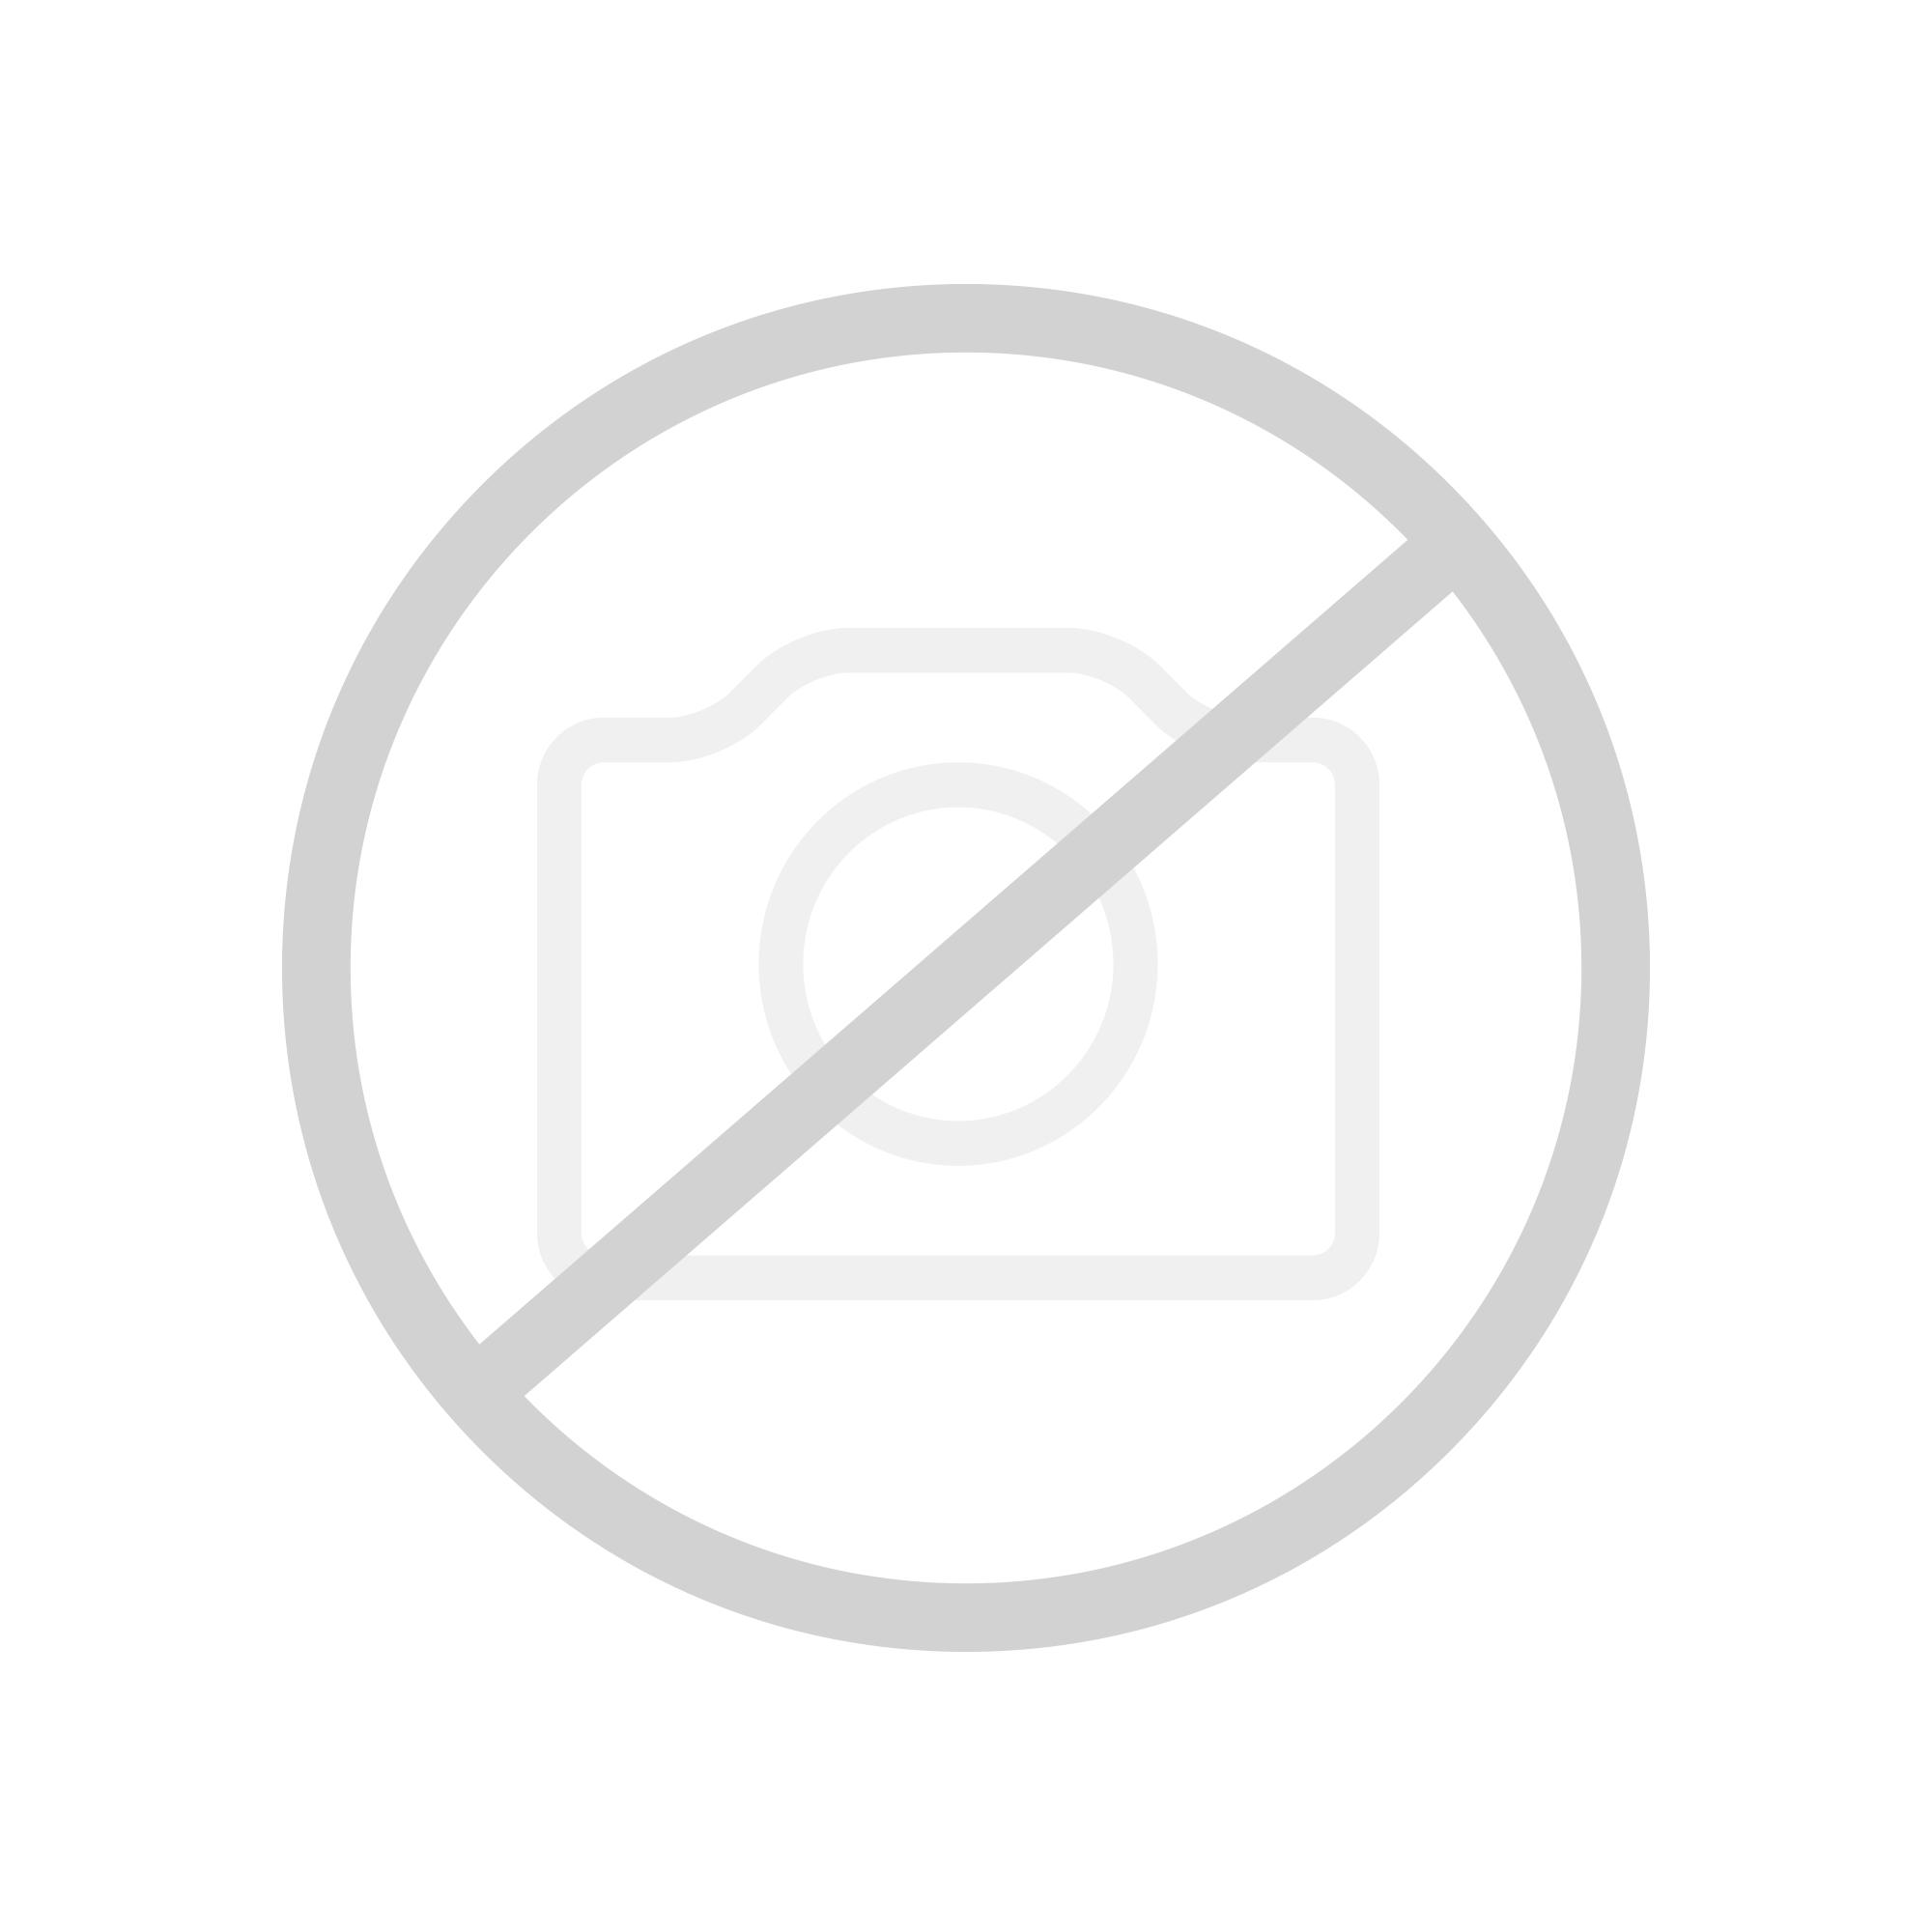 Geberit AquaClean Sela Dusch-WC Komplettanlage, UP, wandhängend L: 57,8 B: 38,5 cm